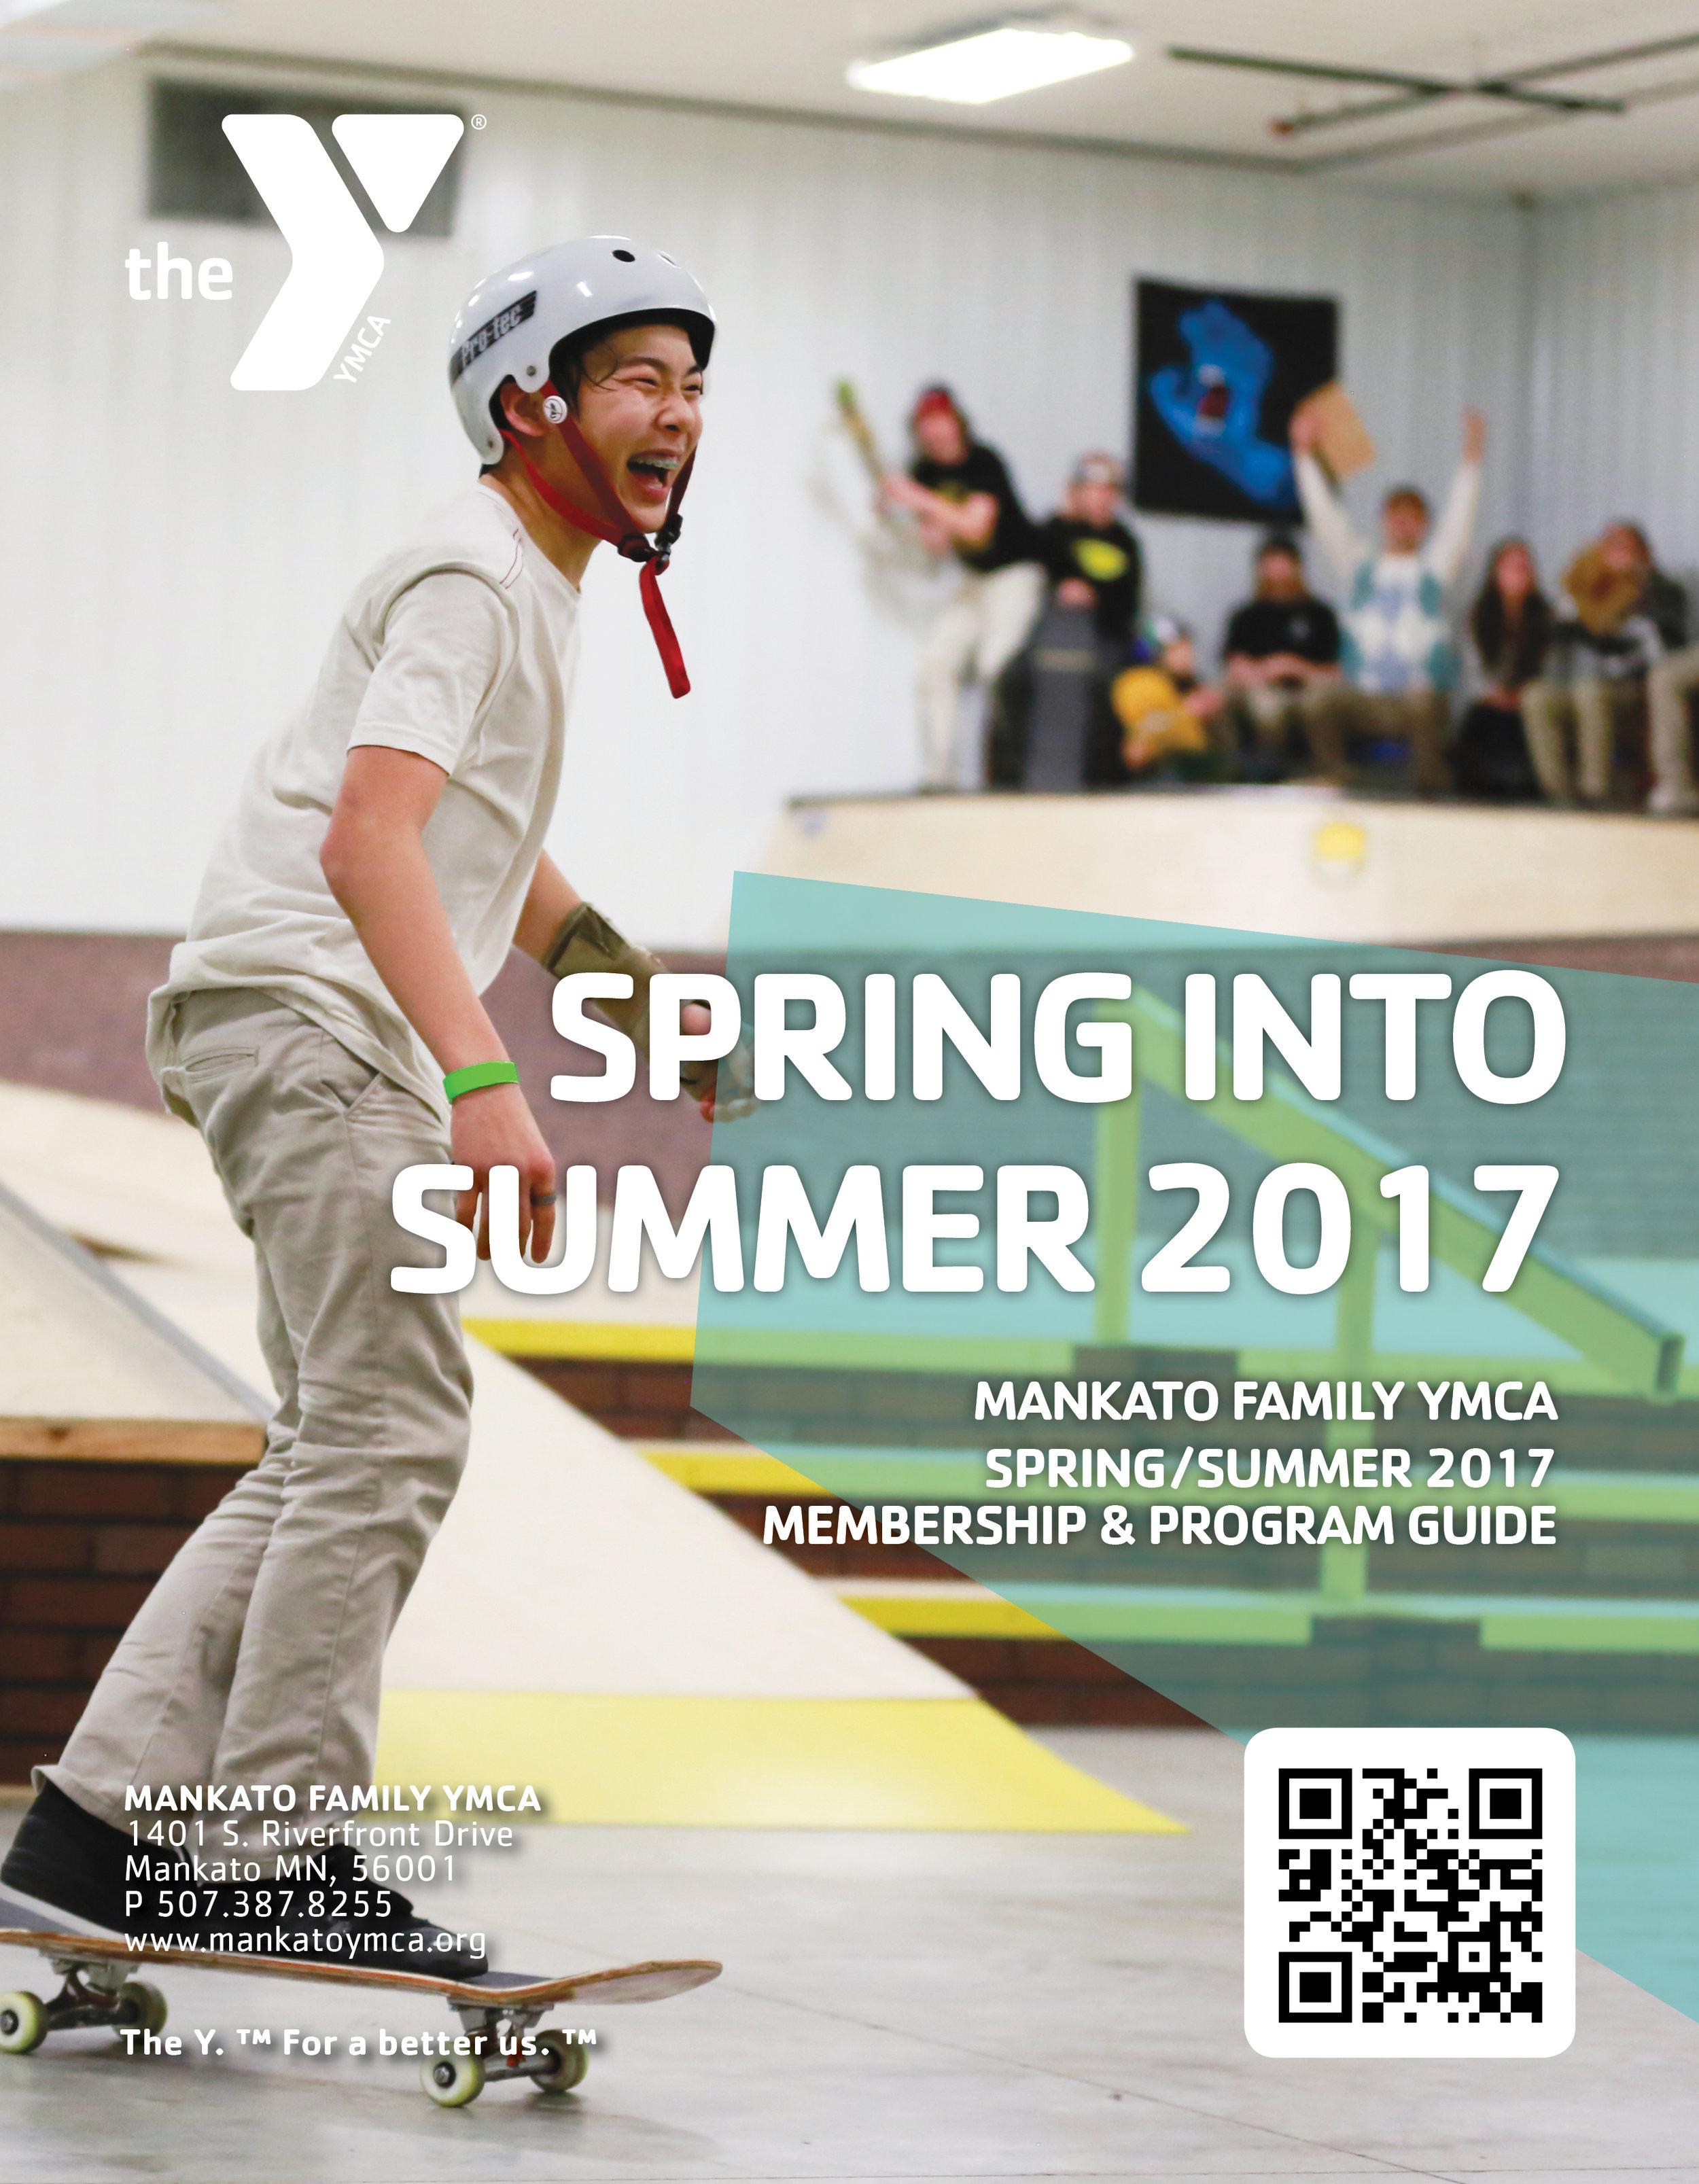 SpringSummer2017-SaraHughes.jpg